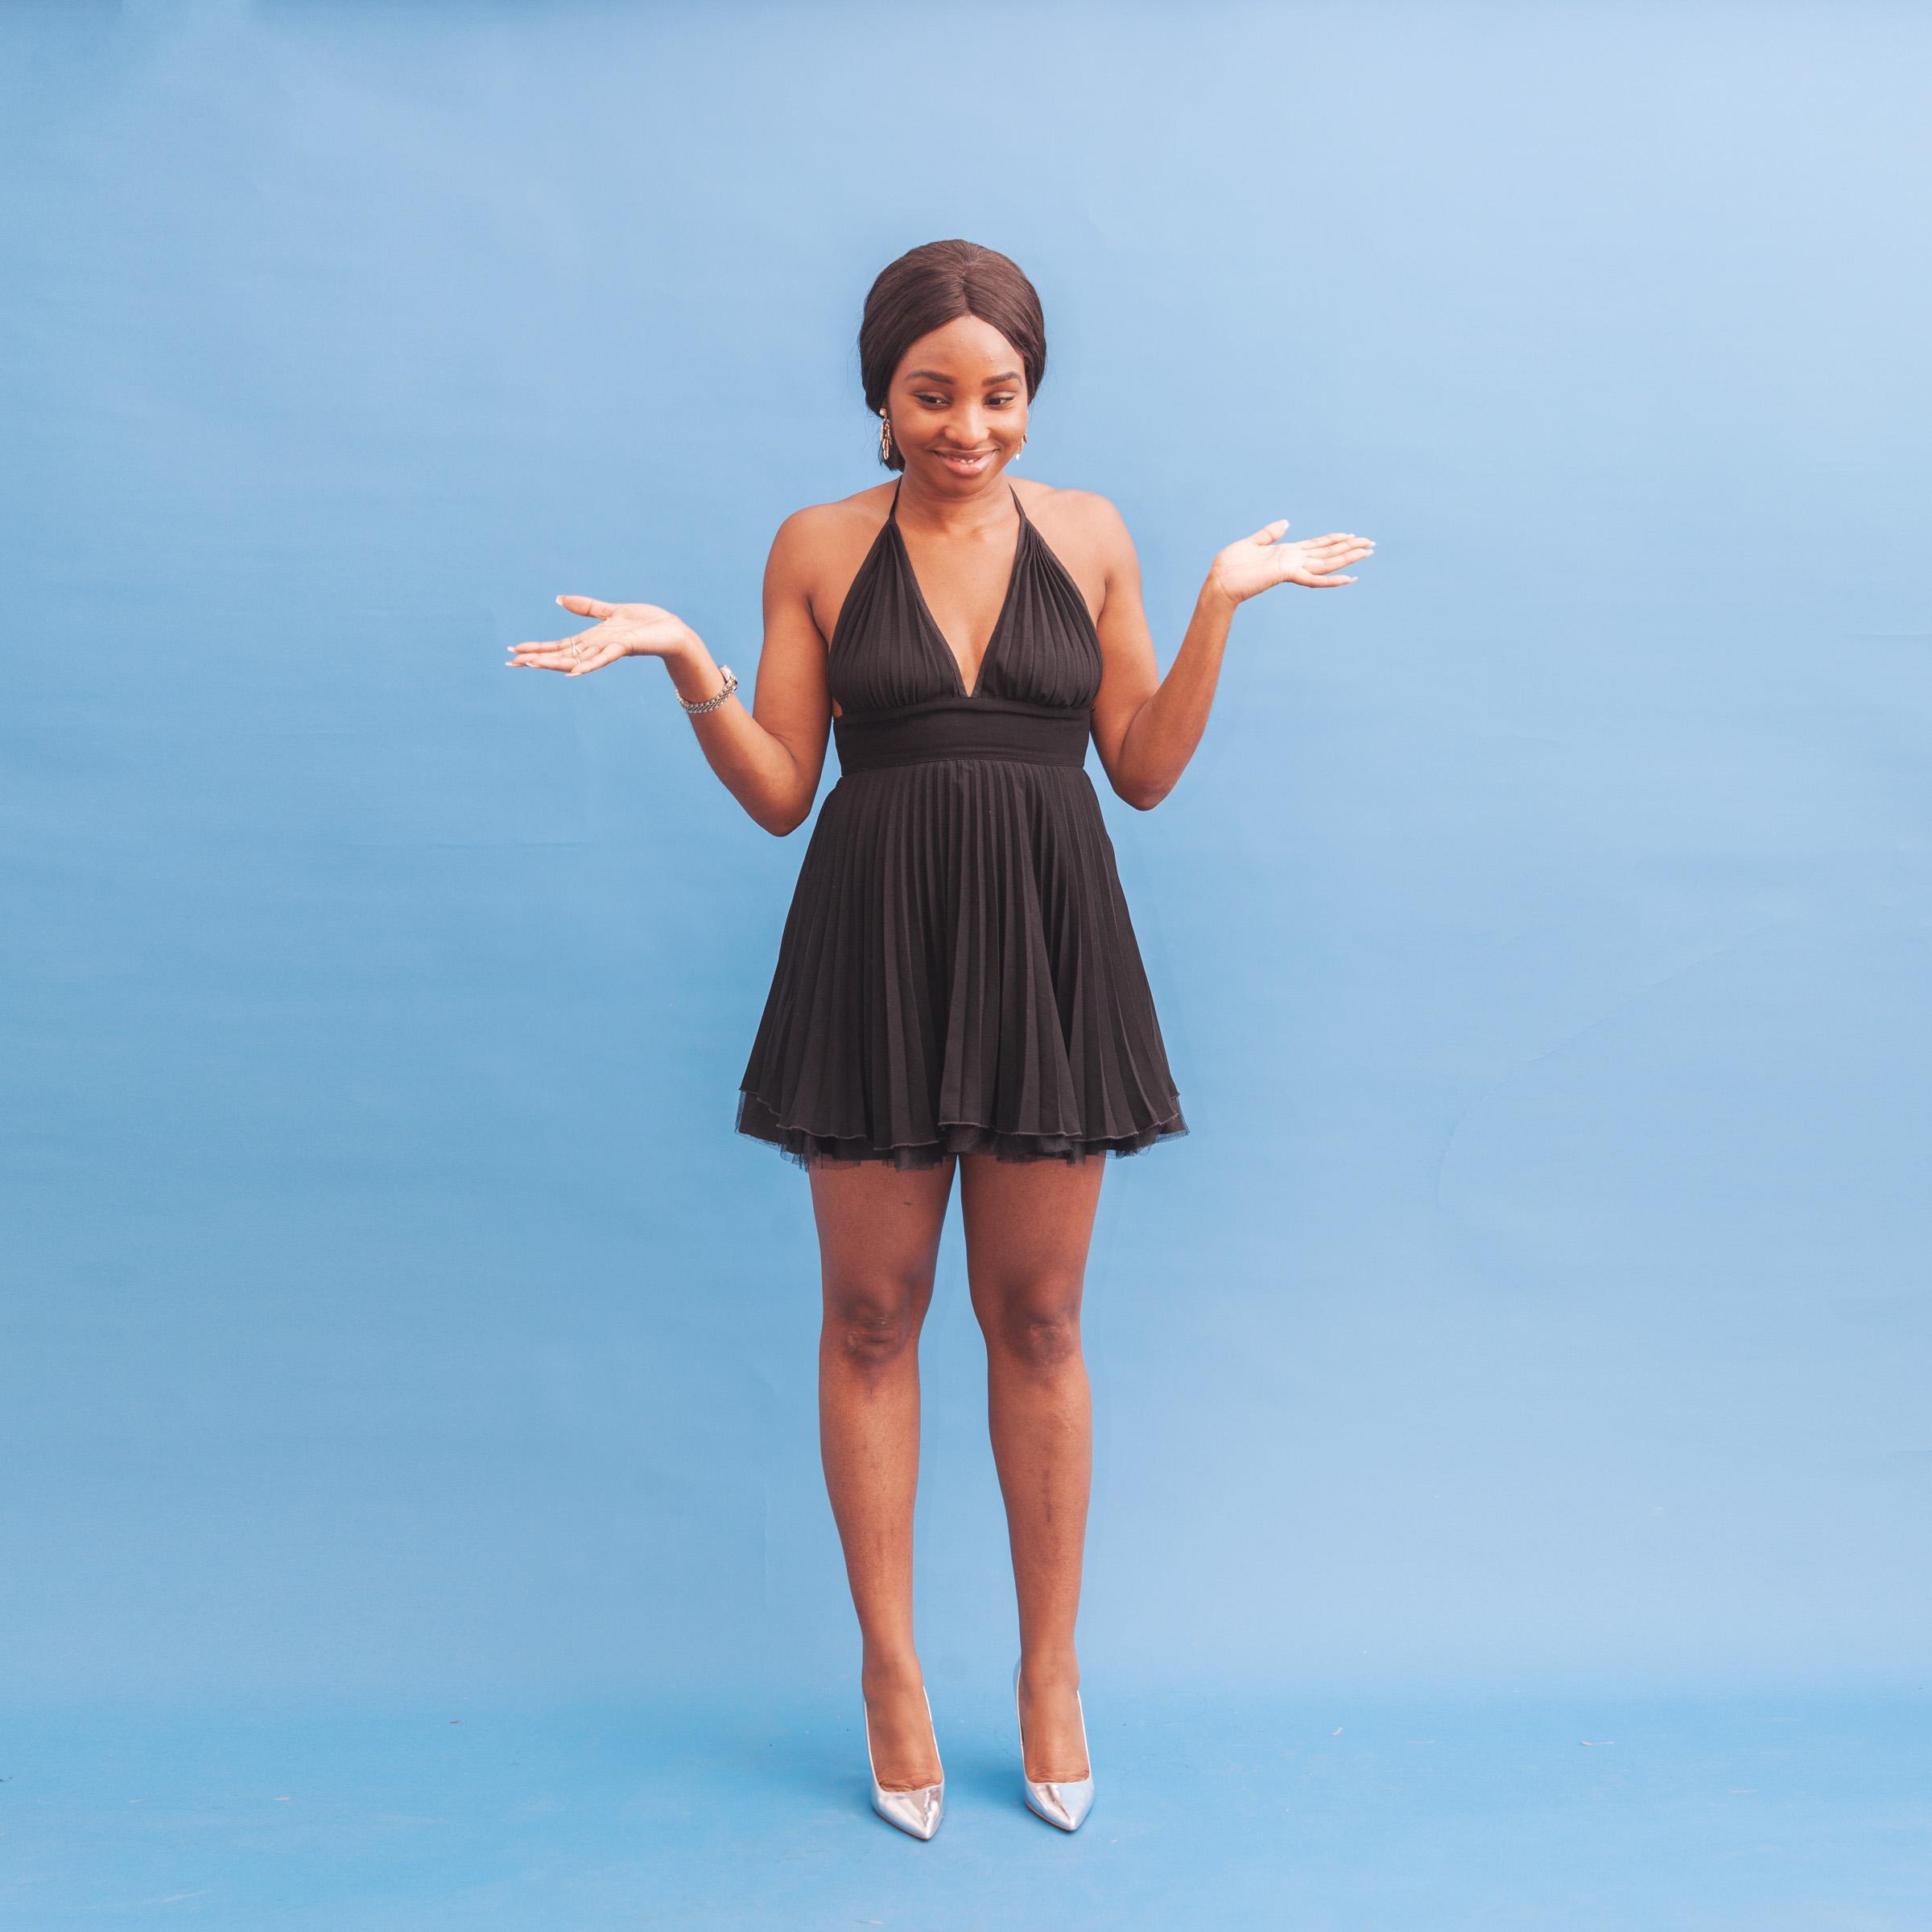 People Show Us Their \'Revenge Dress\' Looks - Broadly